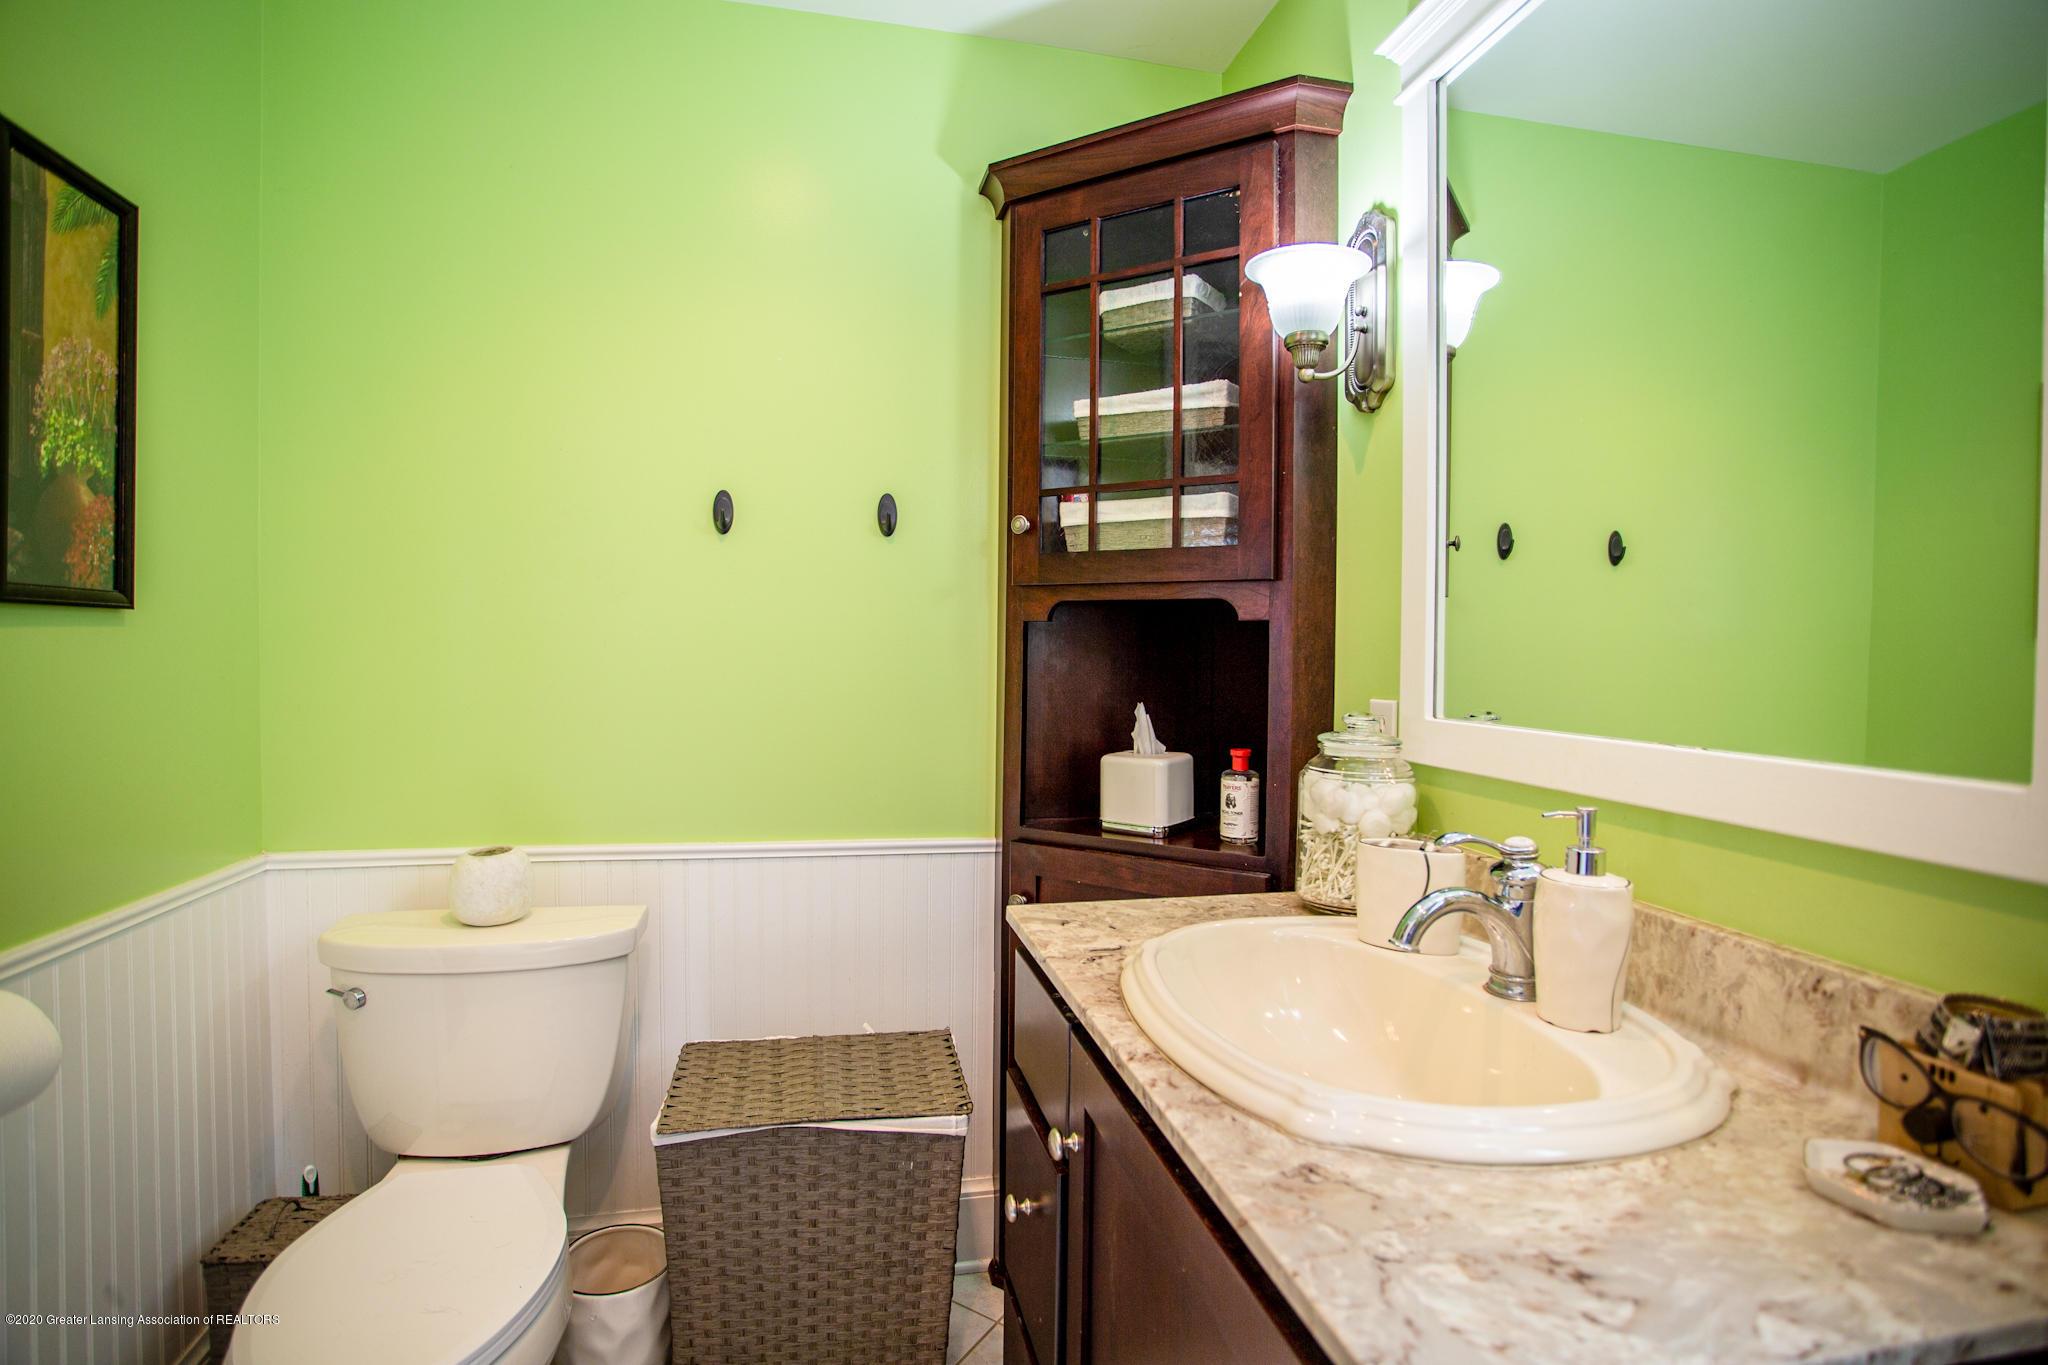 116 S Clinton St - Bathroom 1 Charlotte-22 - 12